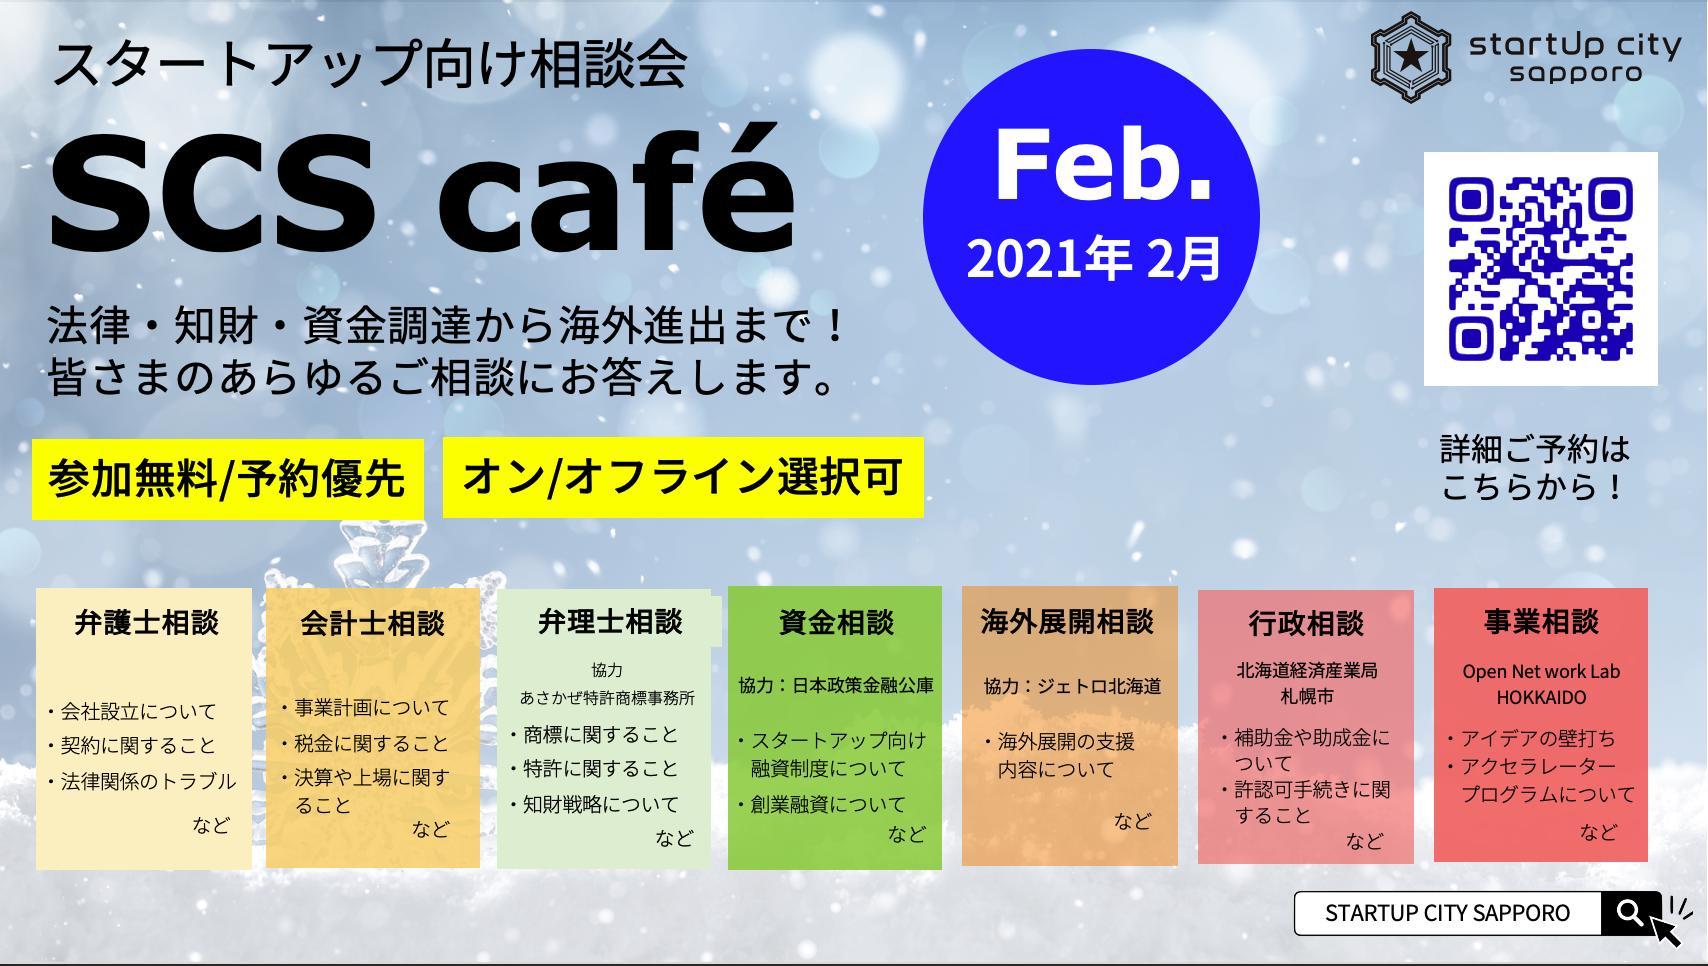 【STARTUP CITY SAPPORO café】2月スタートアップ向け相談会のご案内